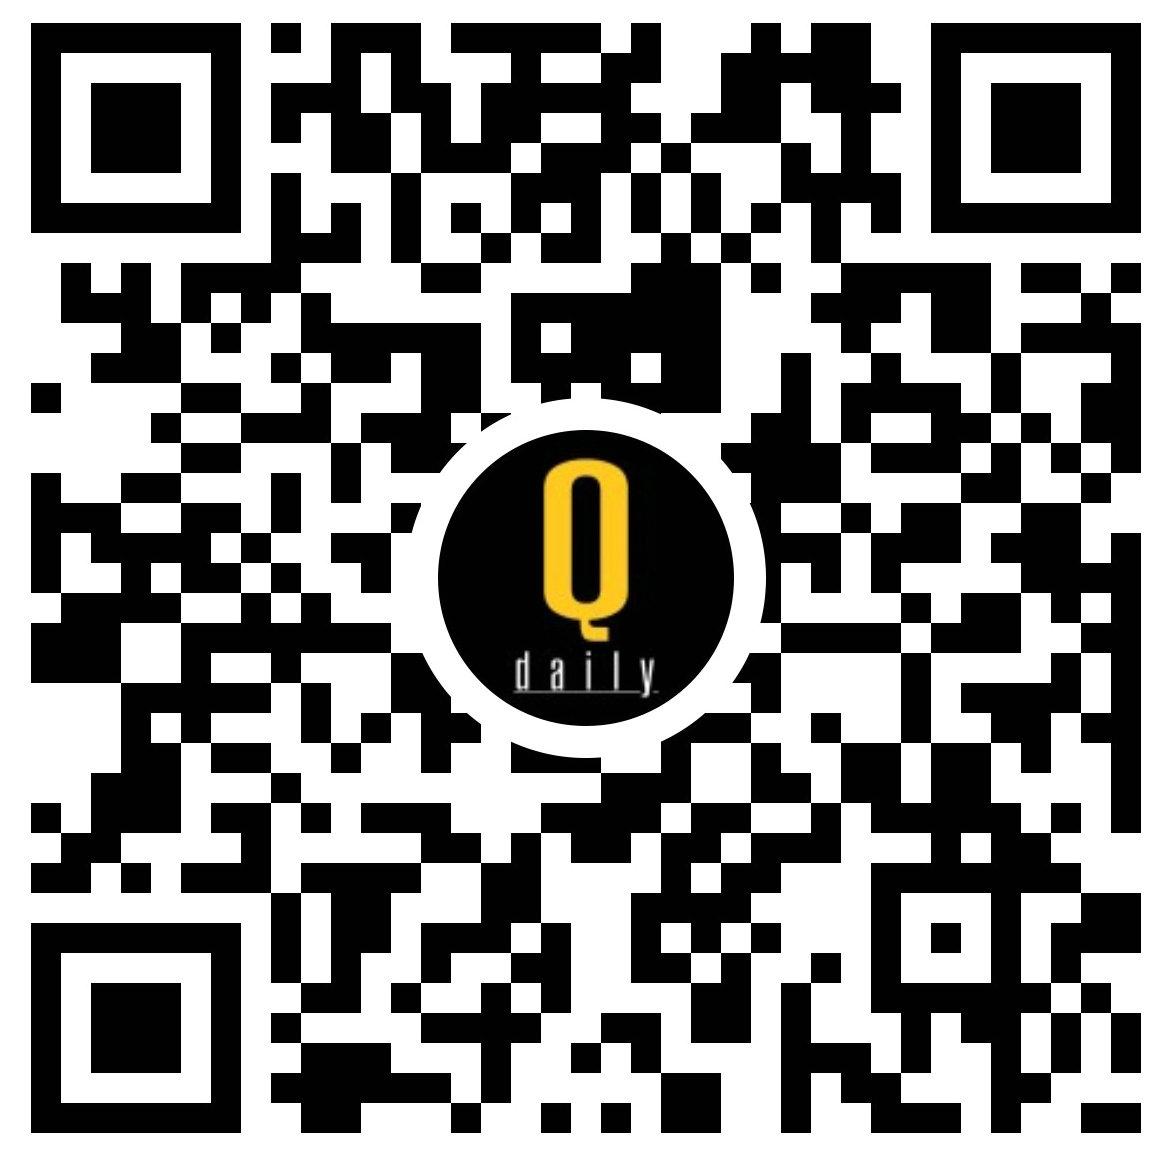 Qdaily-小程序二维码